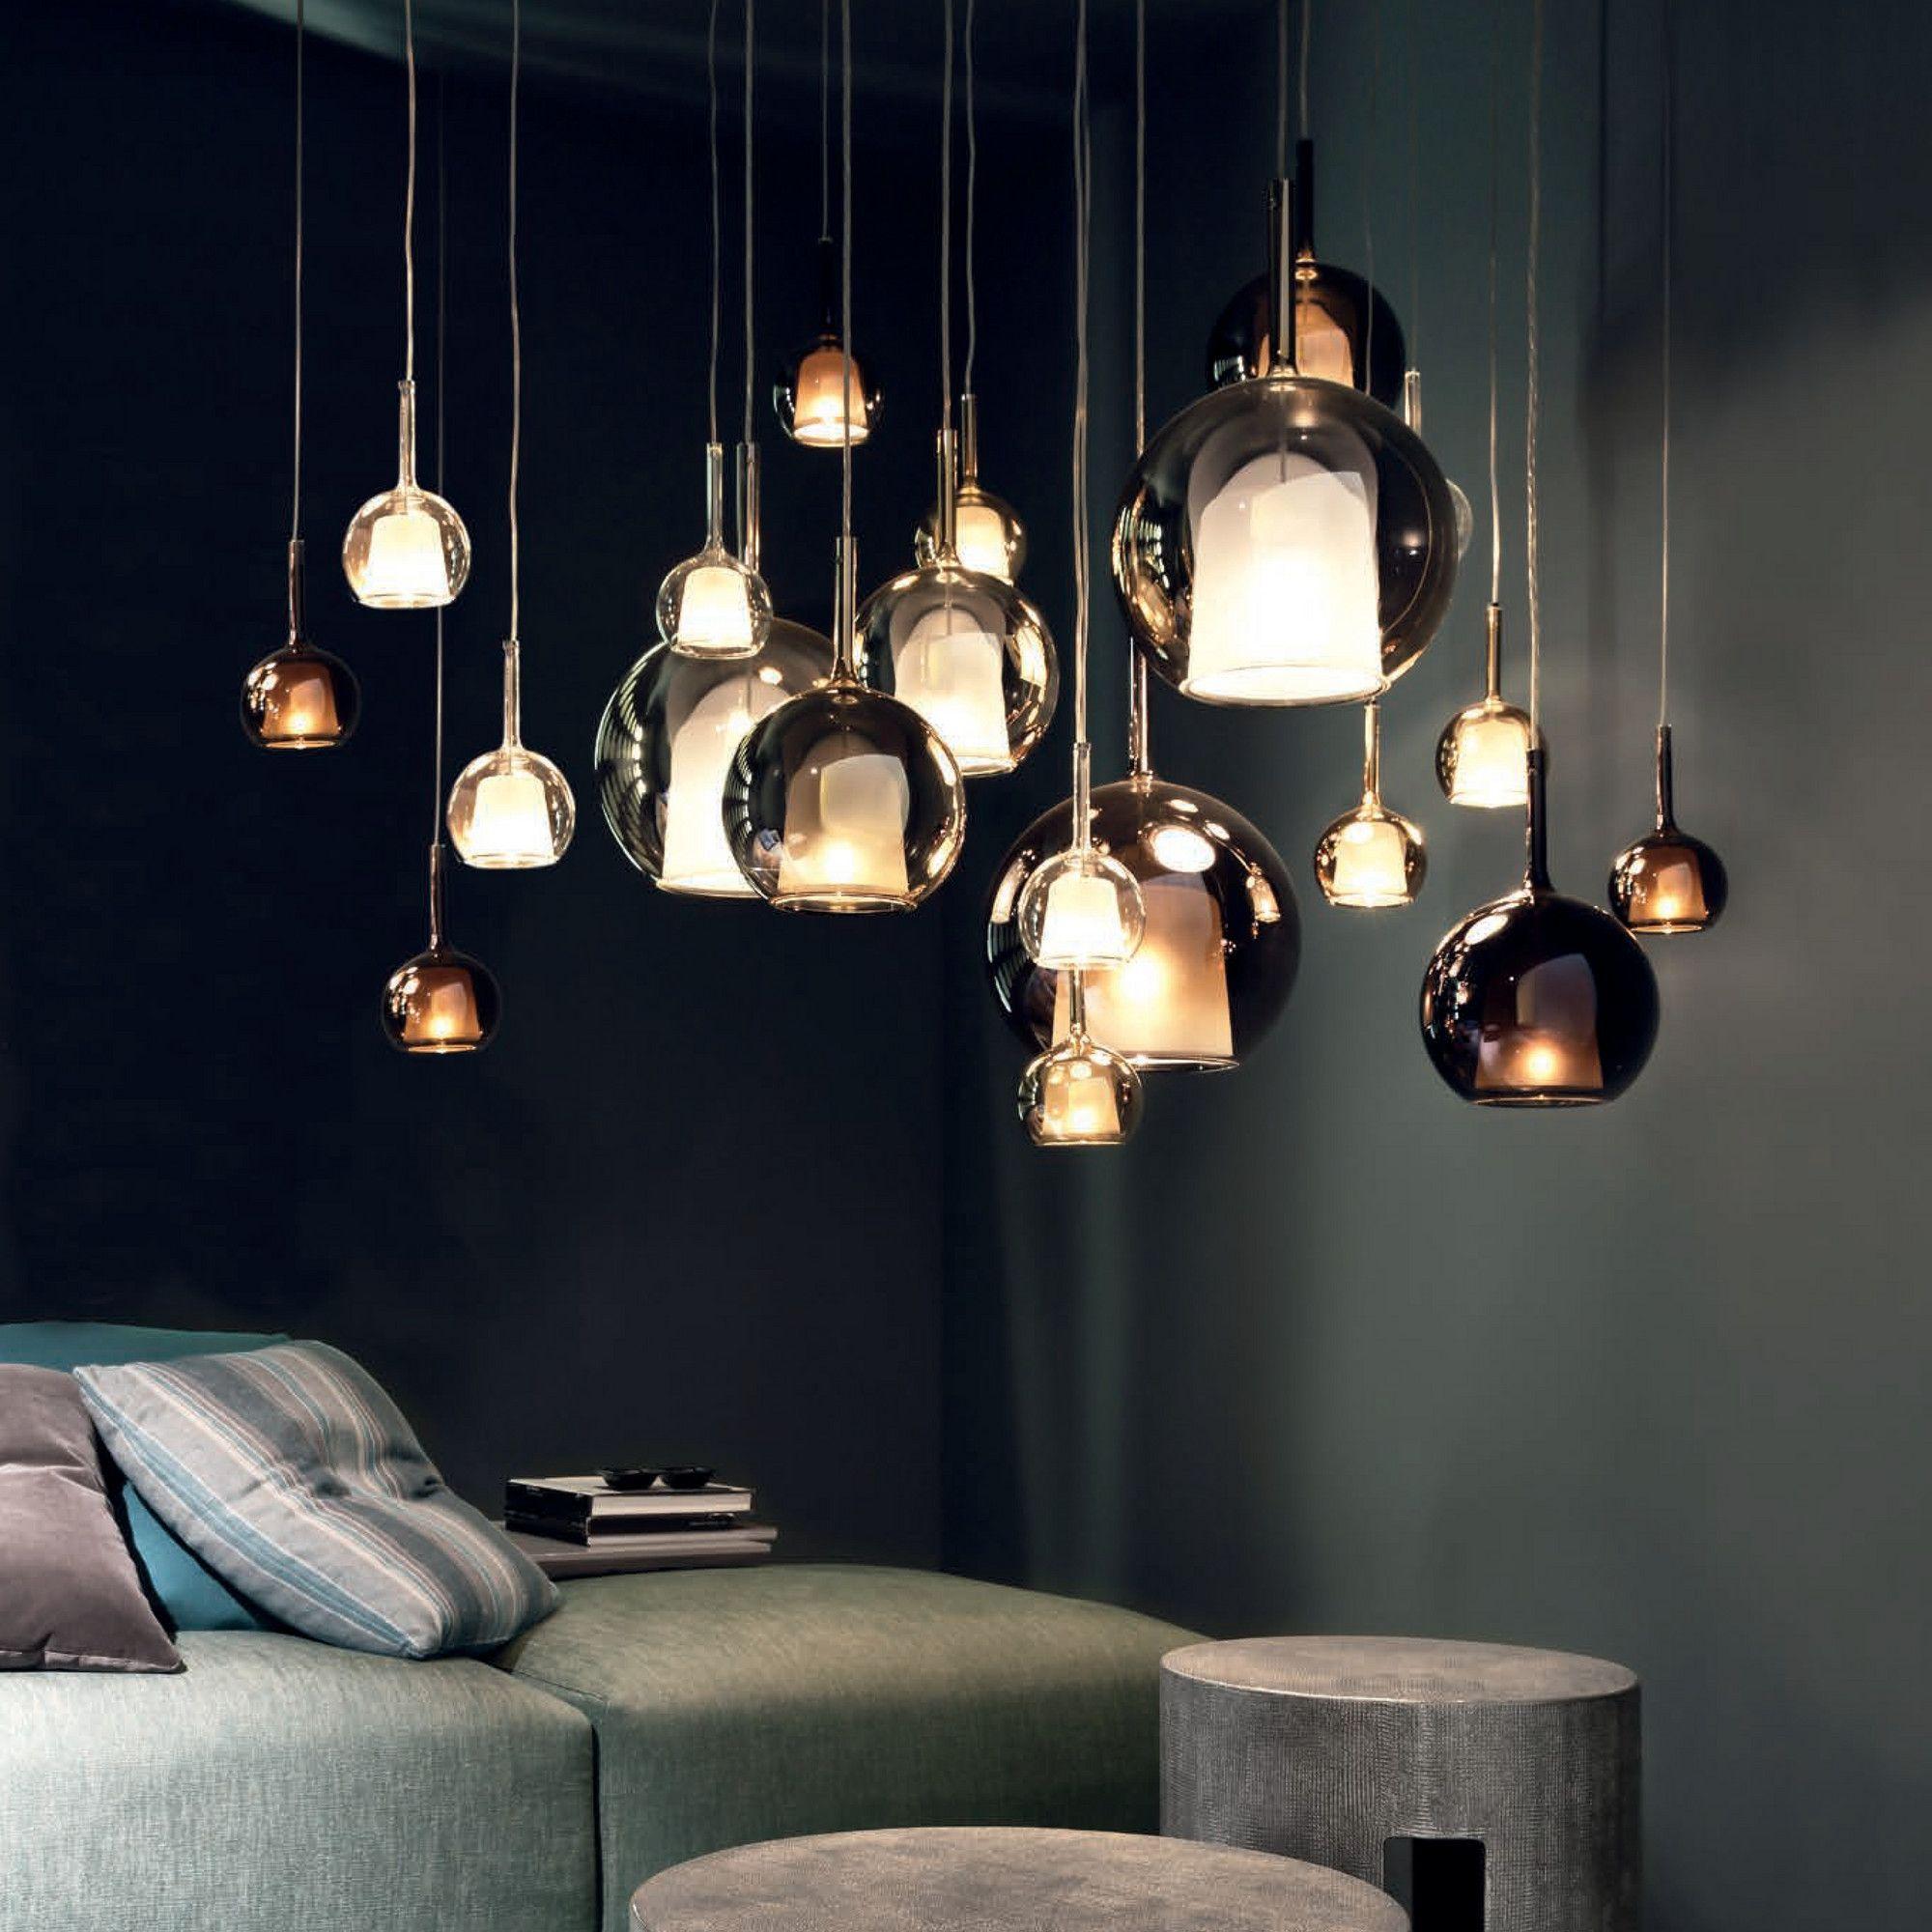 Penta Catalogue 2017 Lampen Wohnzimmer Lampen Esszimmer